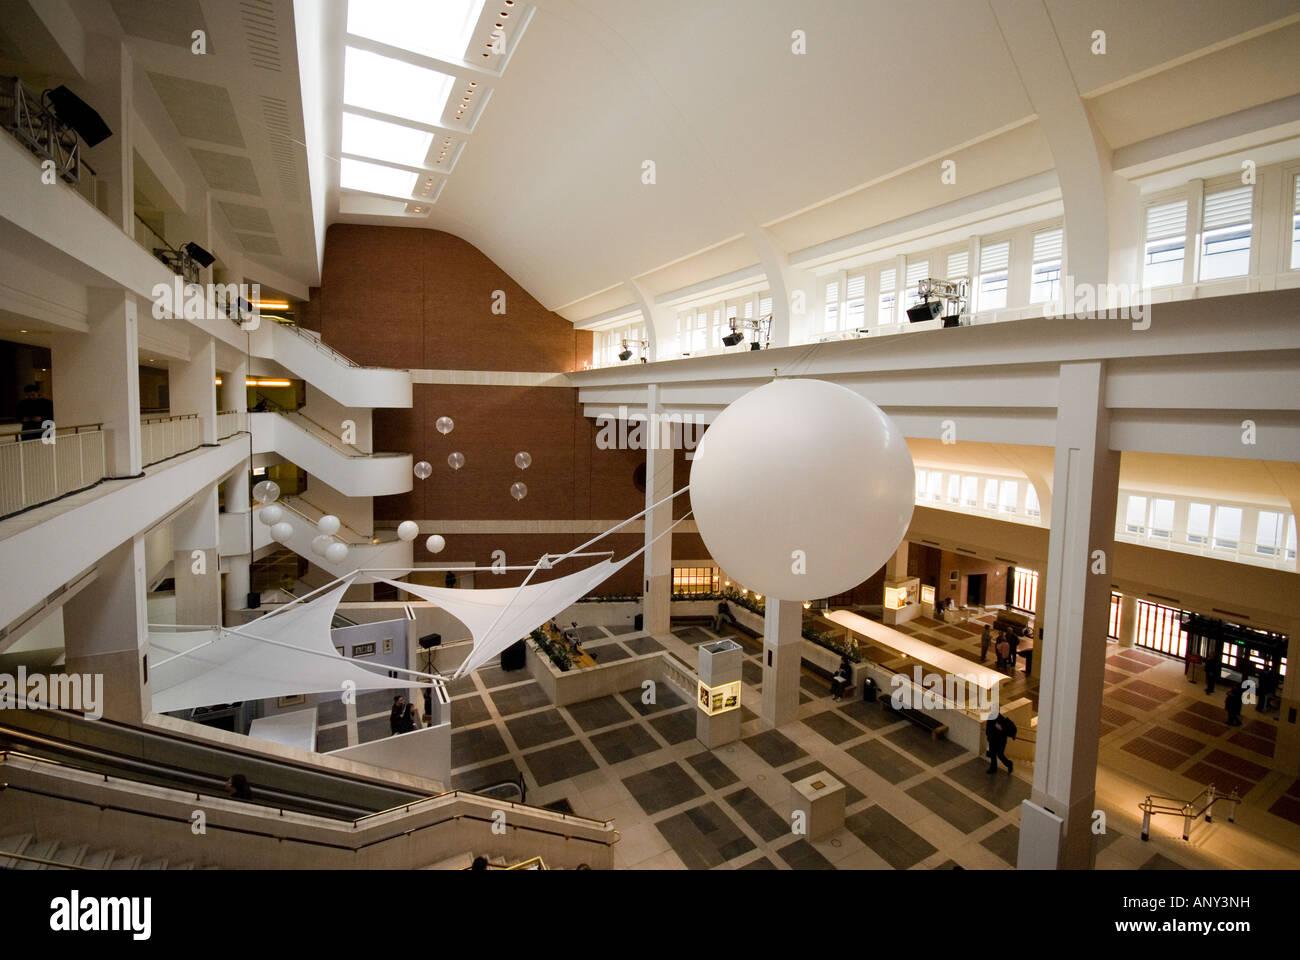 British Library Inside White Balloons London